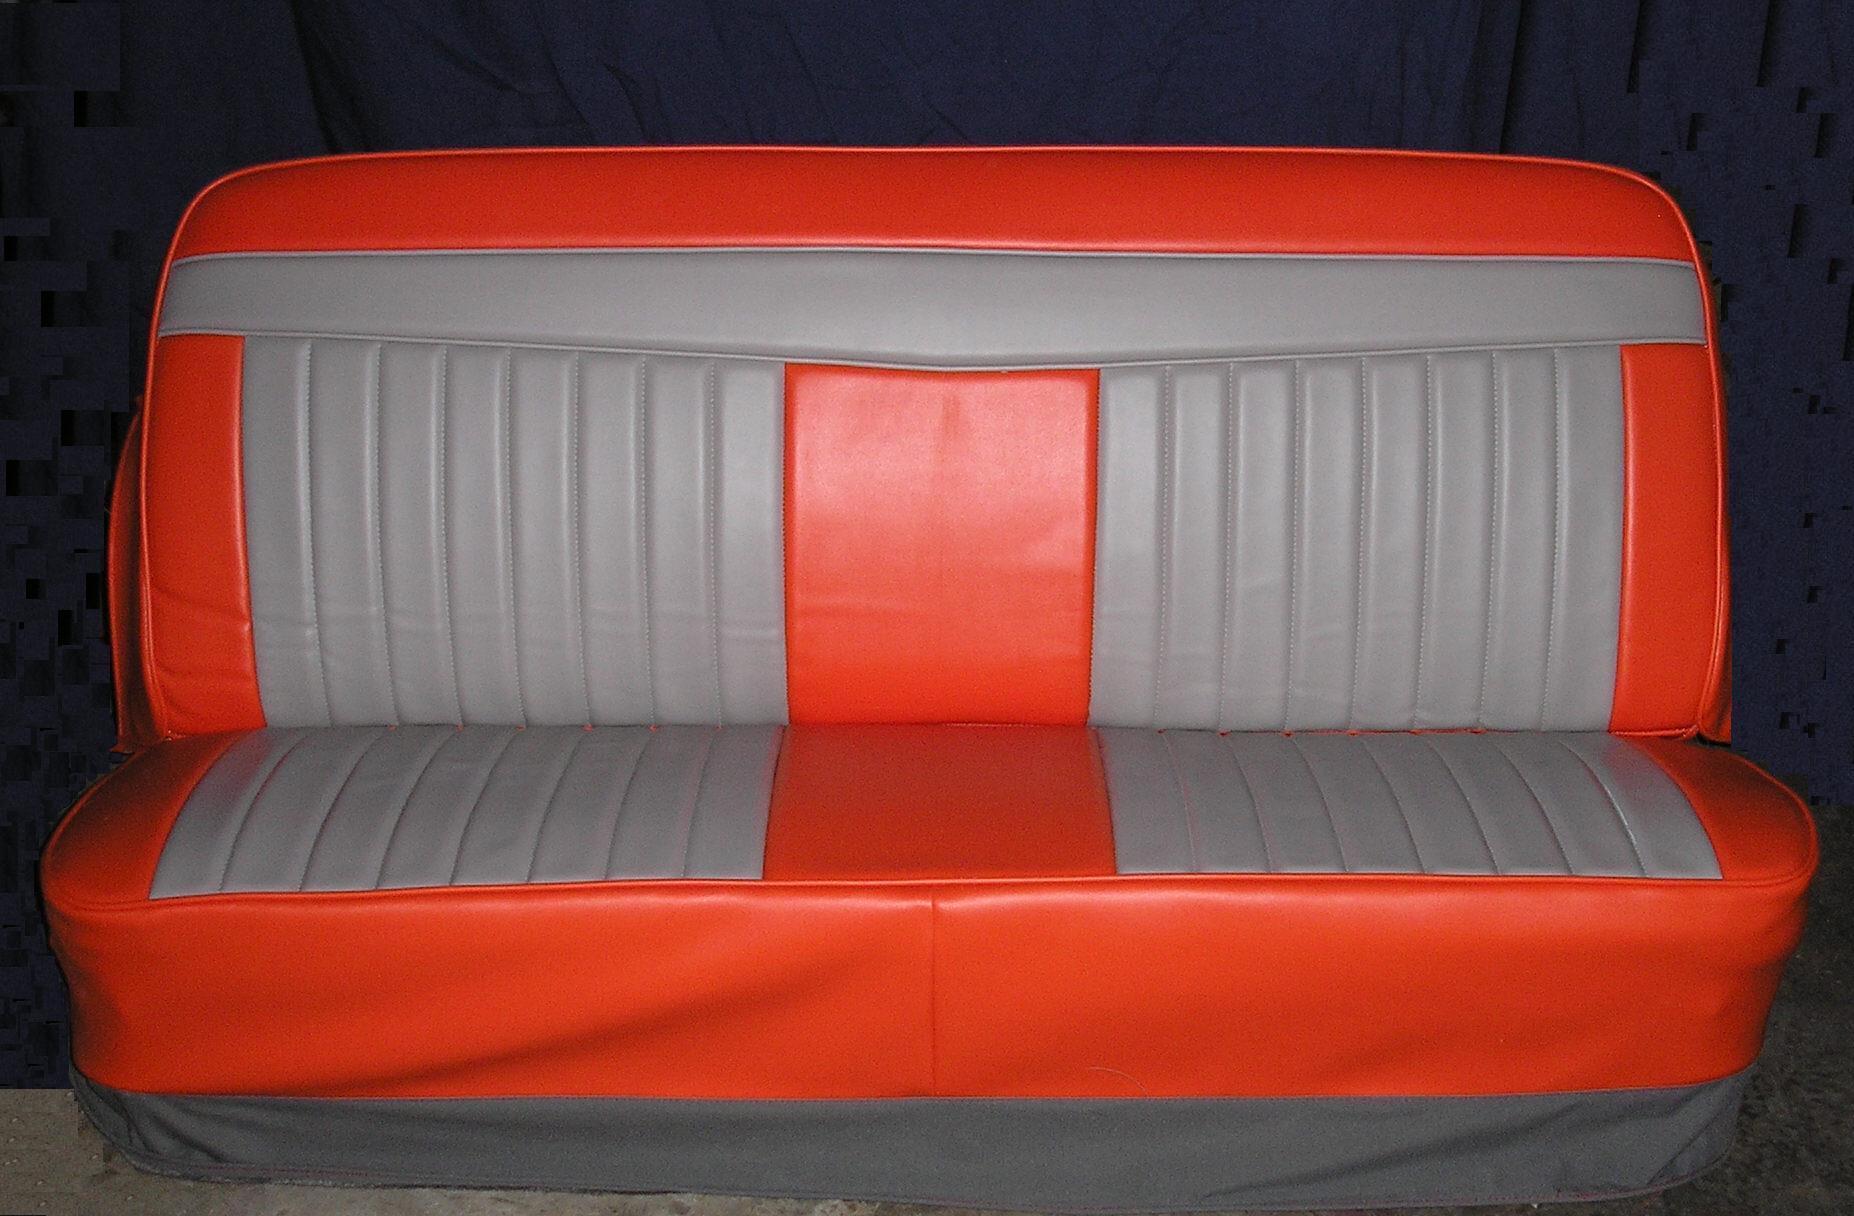 Ics Bench Truck Seat Covers Rick S Custom Upholstery